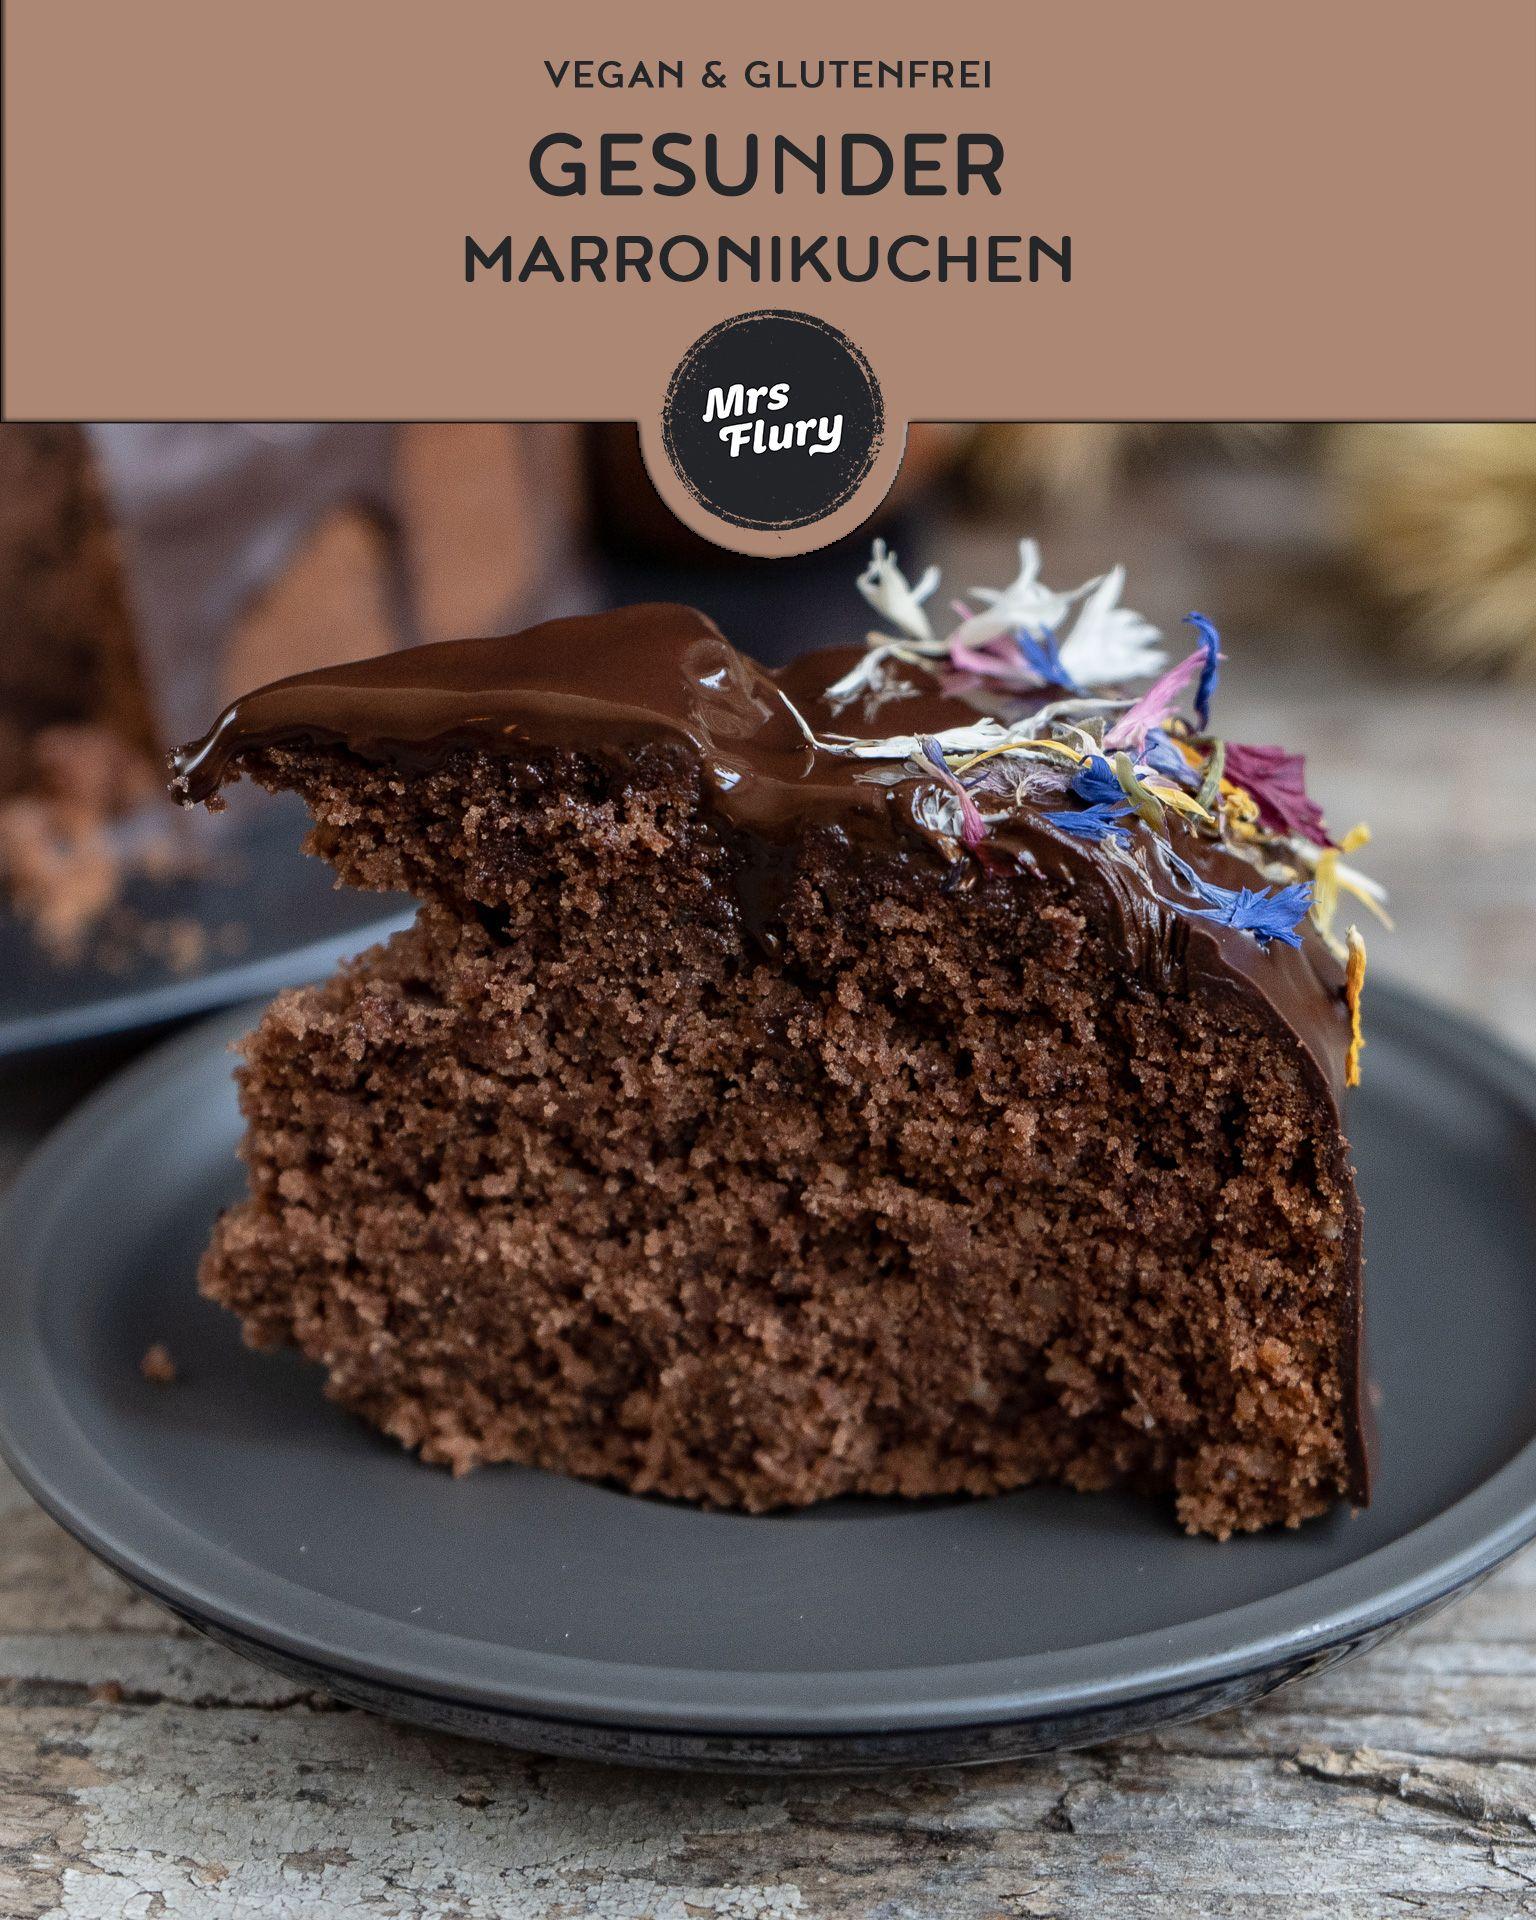 Gesunder Marroni Kuchen Vegan Glutenfrei Rezept Blogger Winter